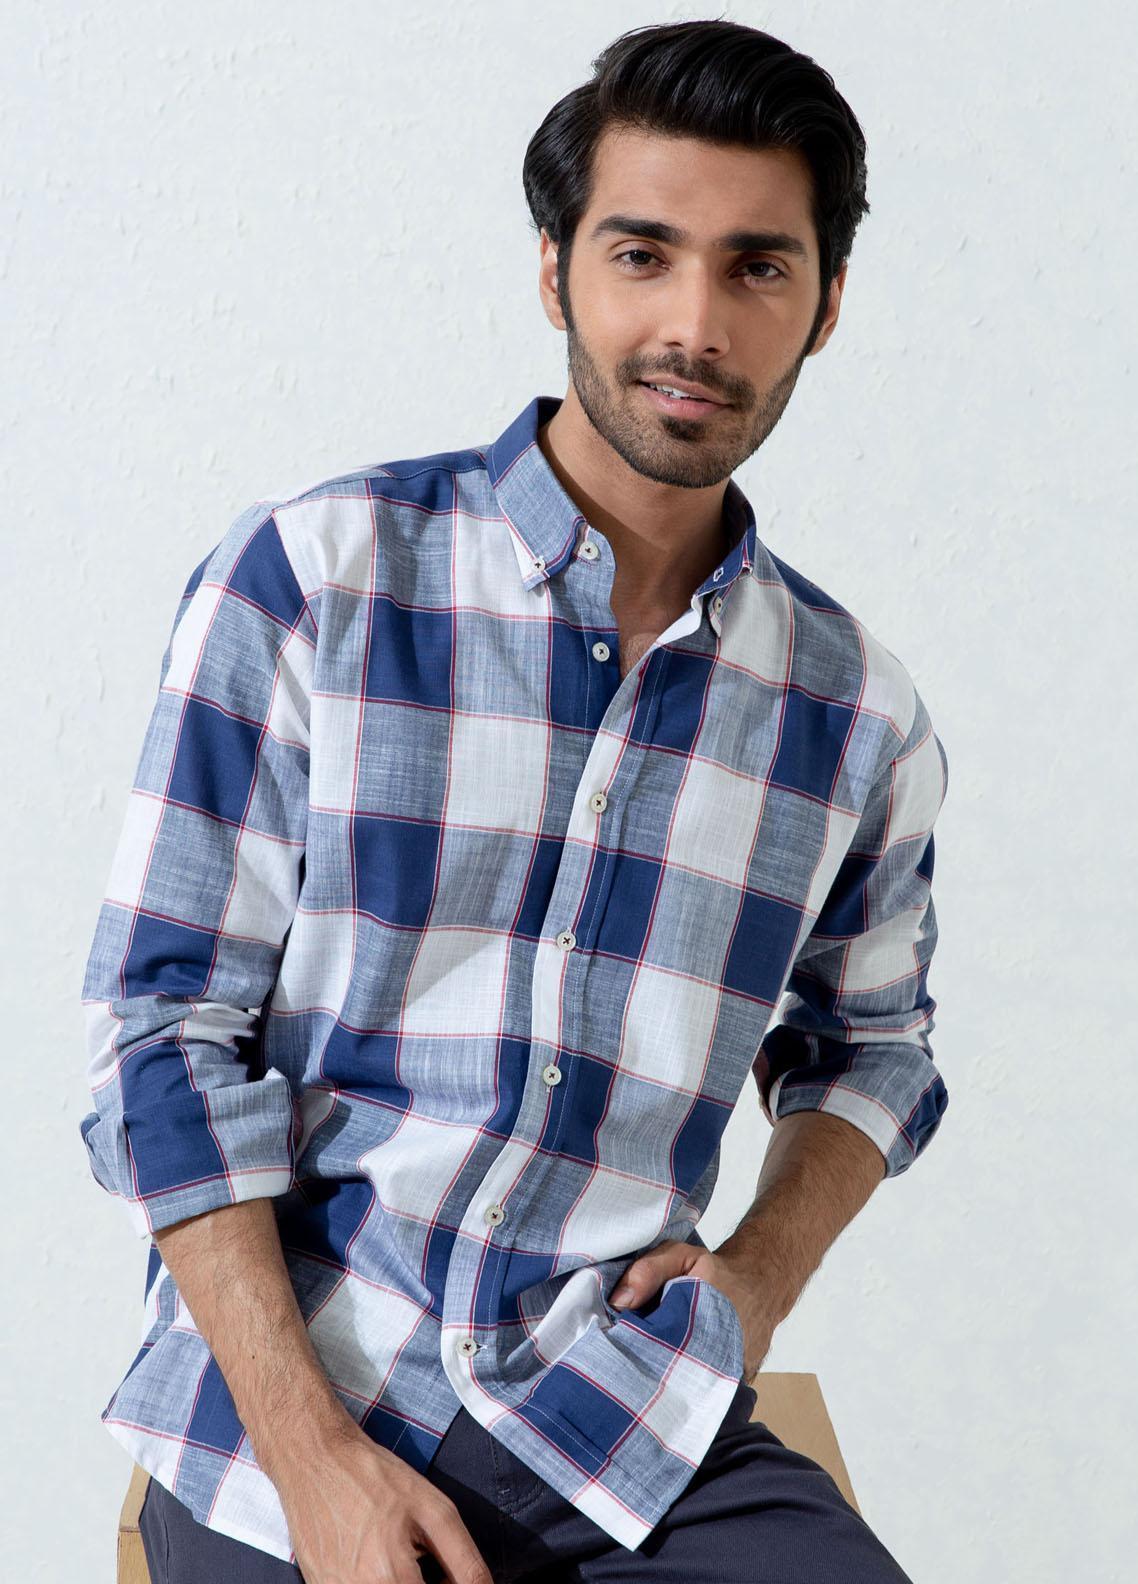 Brumano Cotton Casual Shirts for Men -  Blue & White Slub Textured Checkered